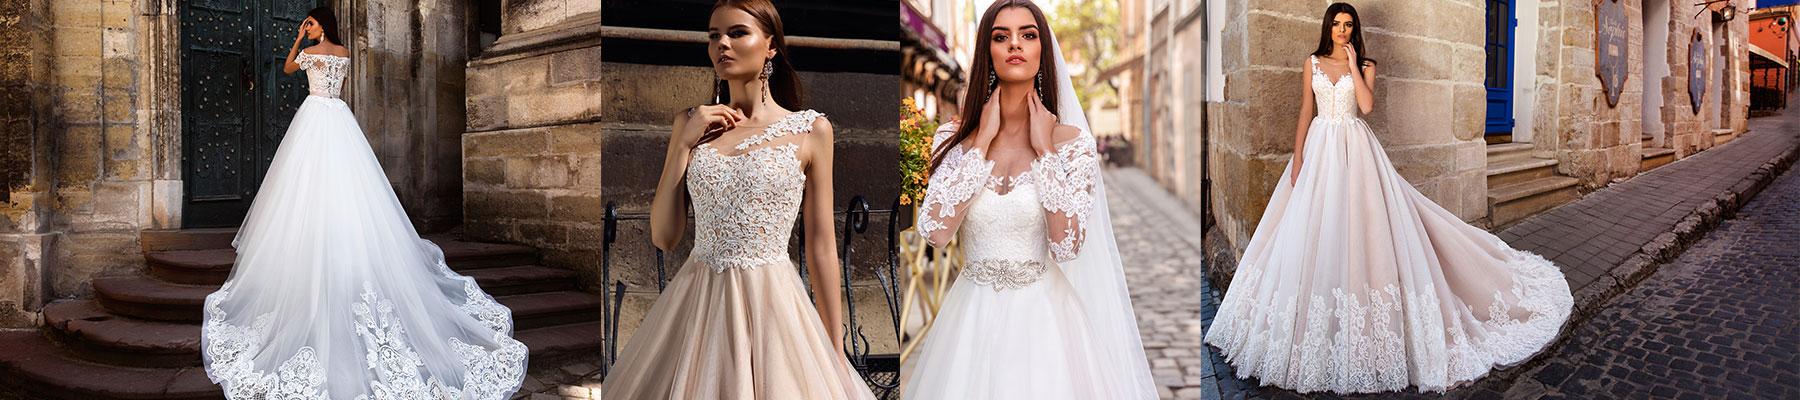 Used Camo Wedding Dresses 90 Amazing